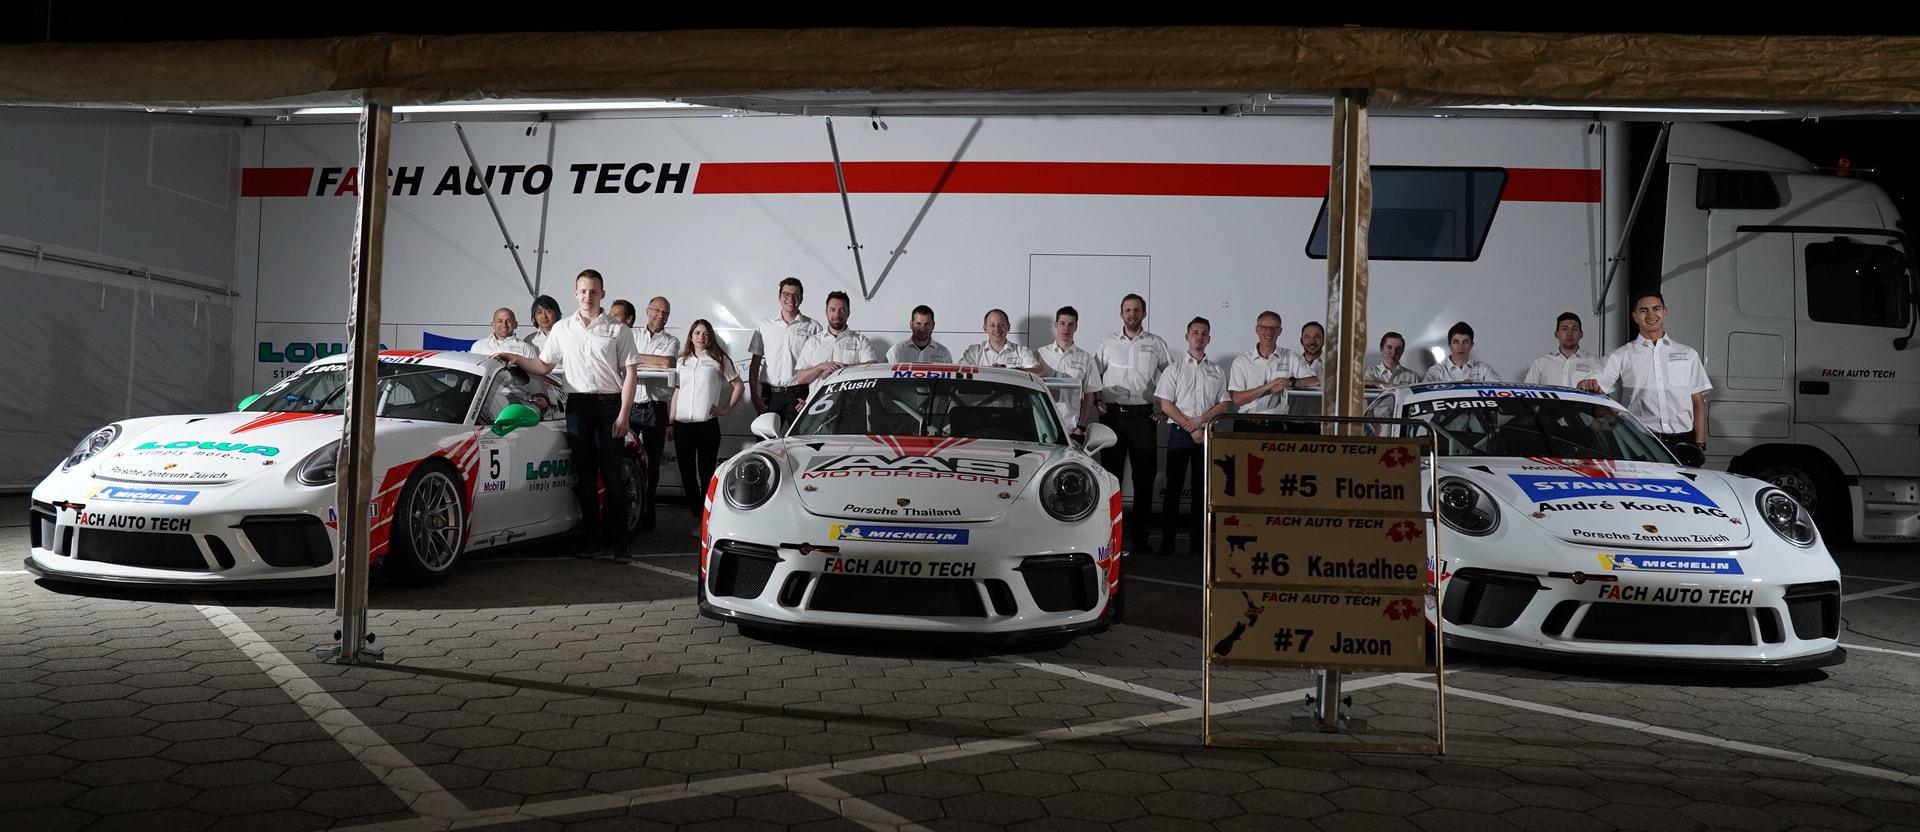 Supercup Fach Auto Tech Mit Drei Neuen Fahrern